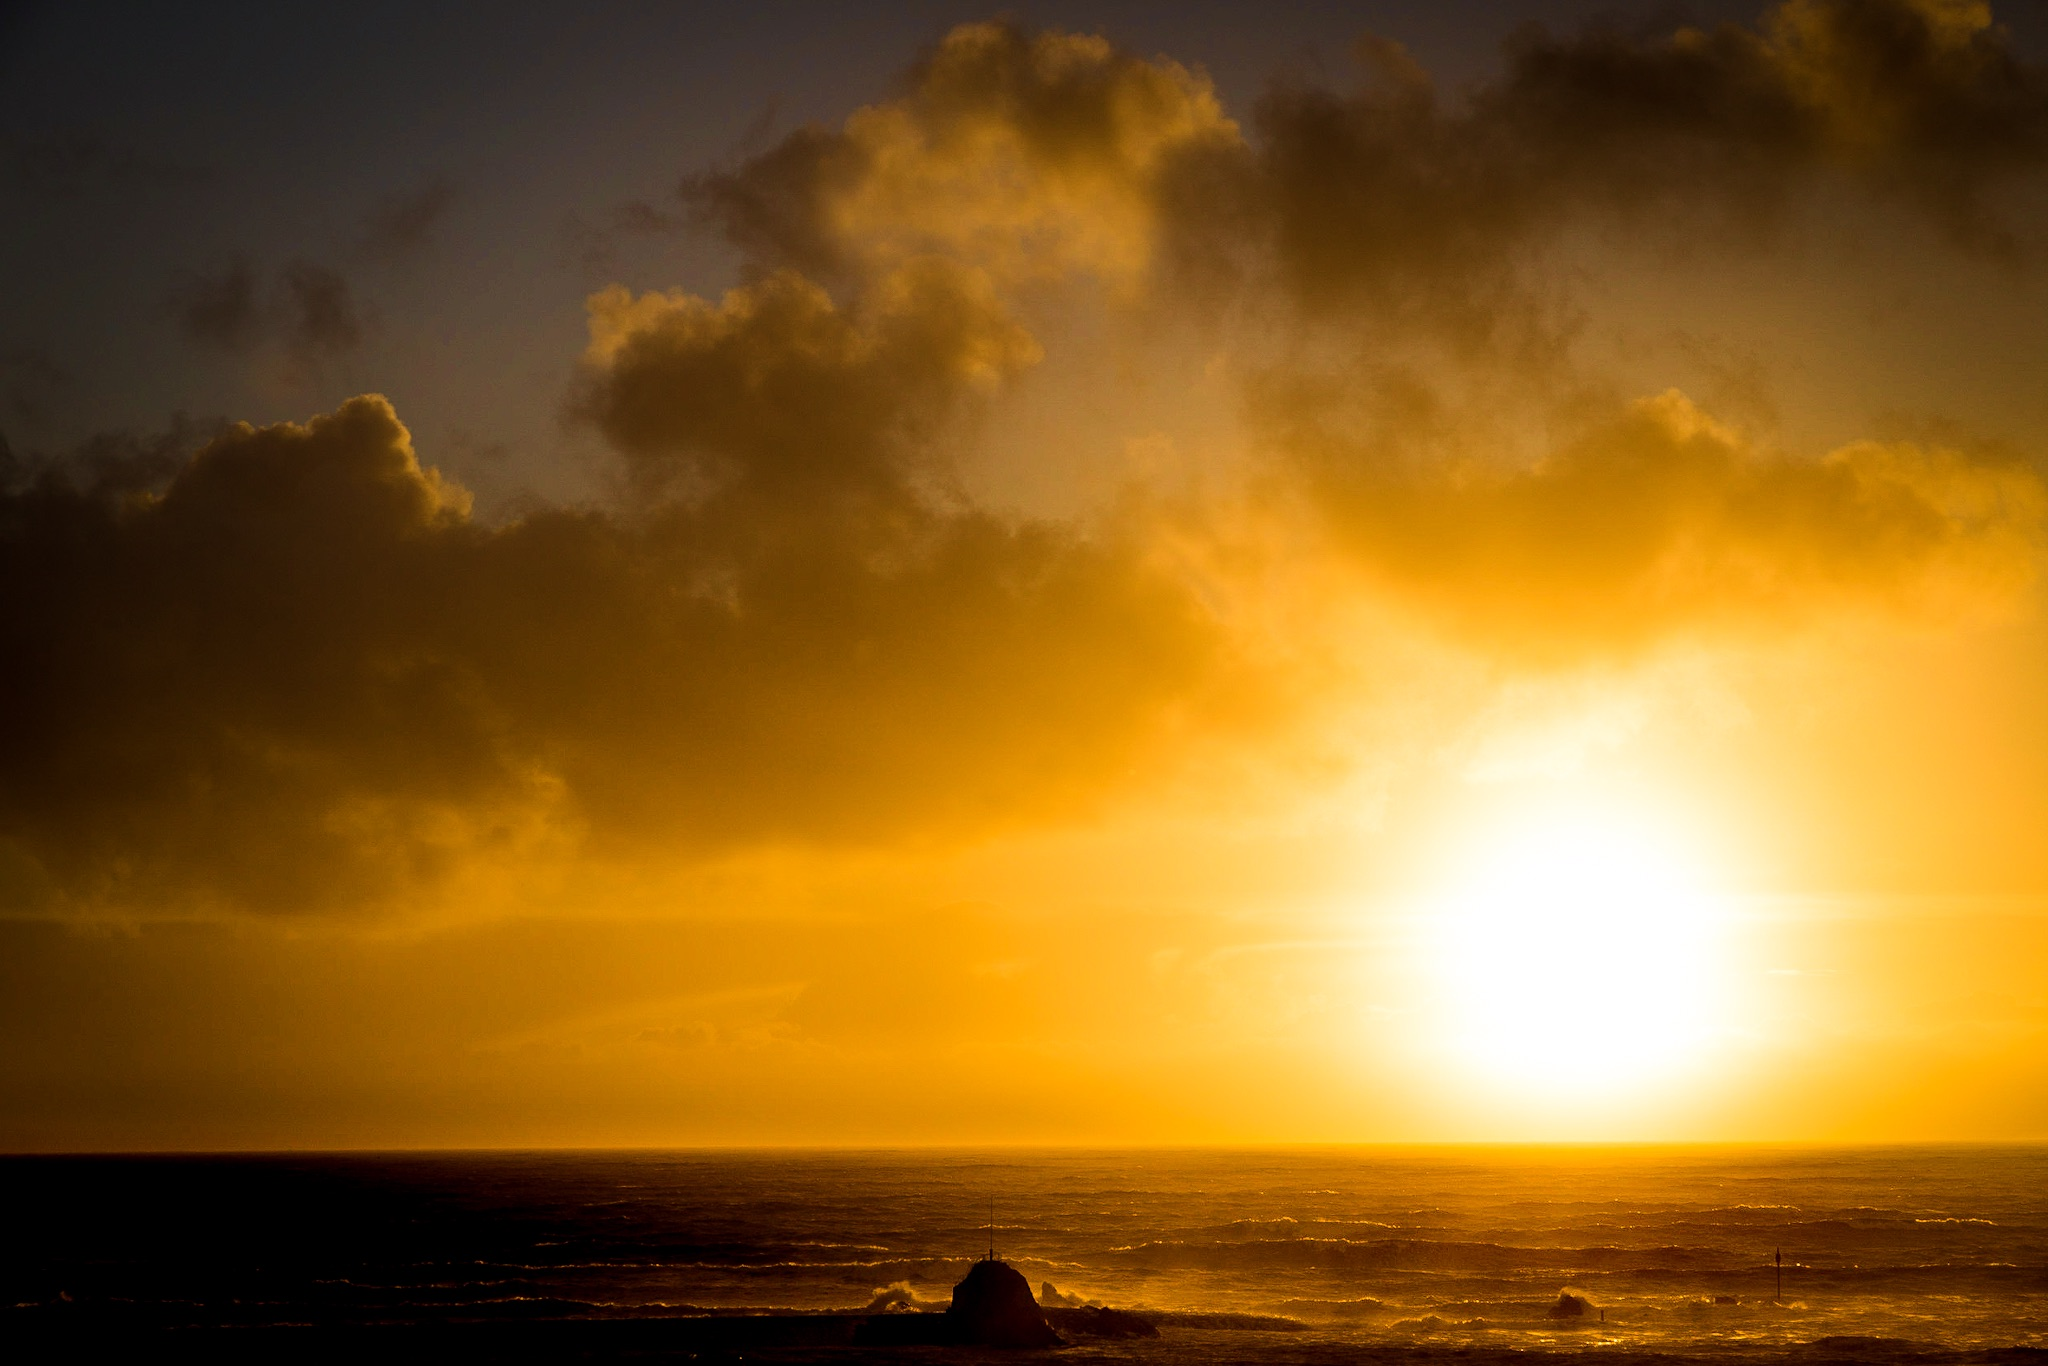 Sun setting over the sea by Rick McEvoy Cornwall Photographer